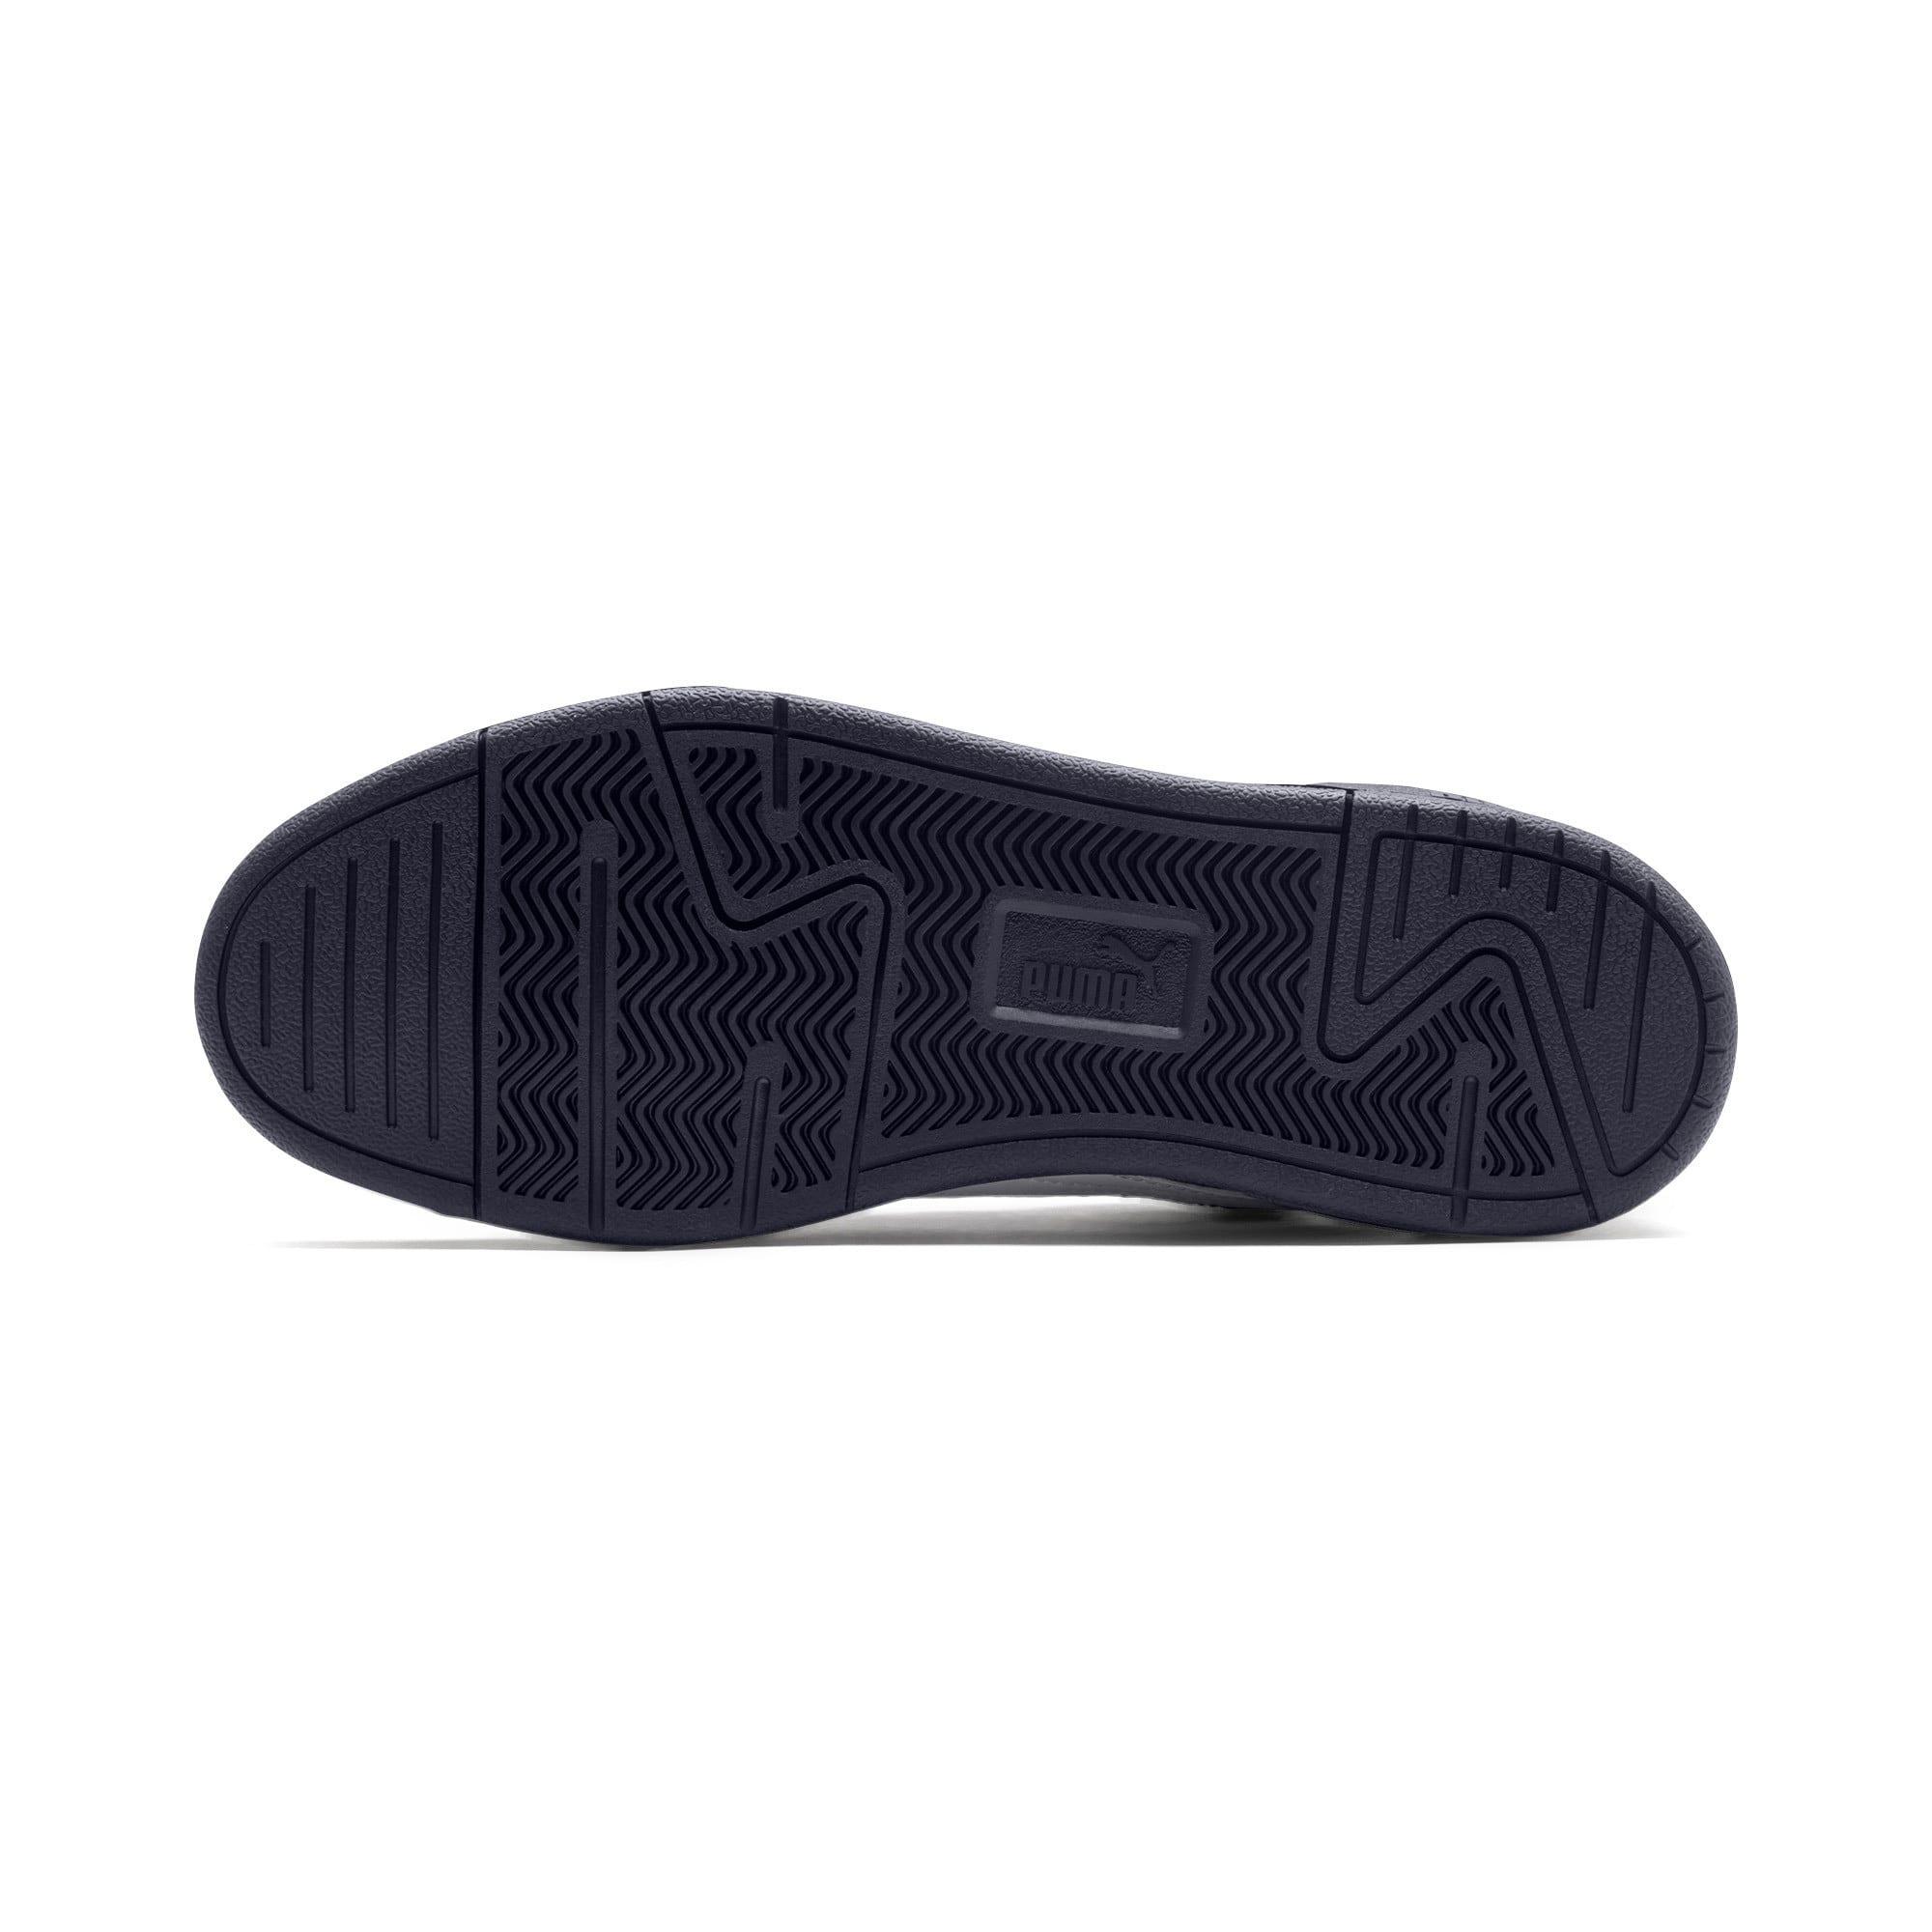 Thumbnail 5 of Red Bull Racing Caracal Sneaker, NIGHT SKY-PumaWhite-NIGHTSKY, medium